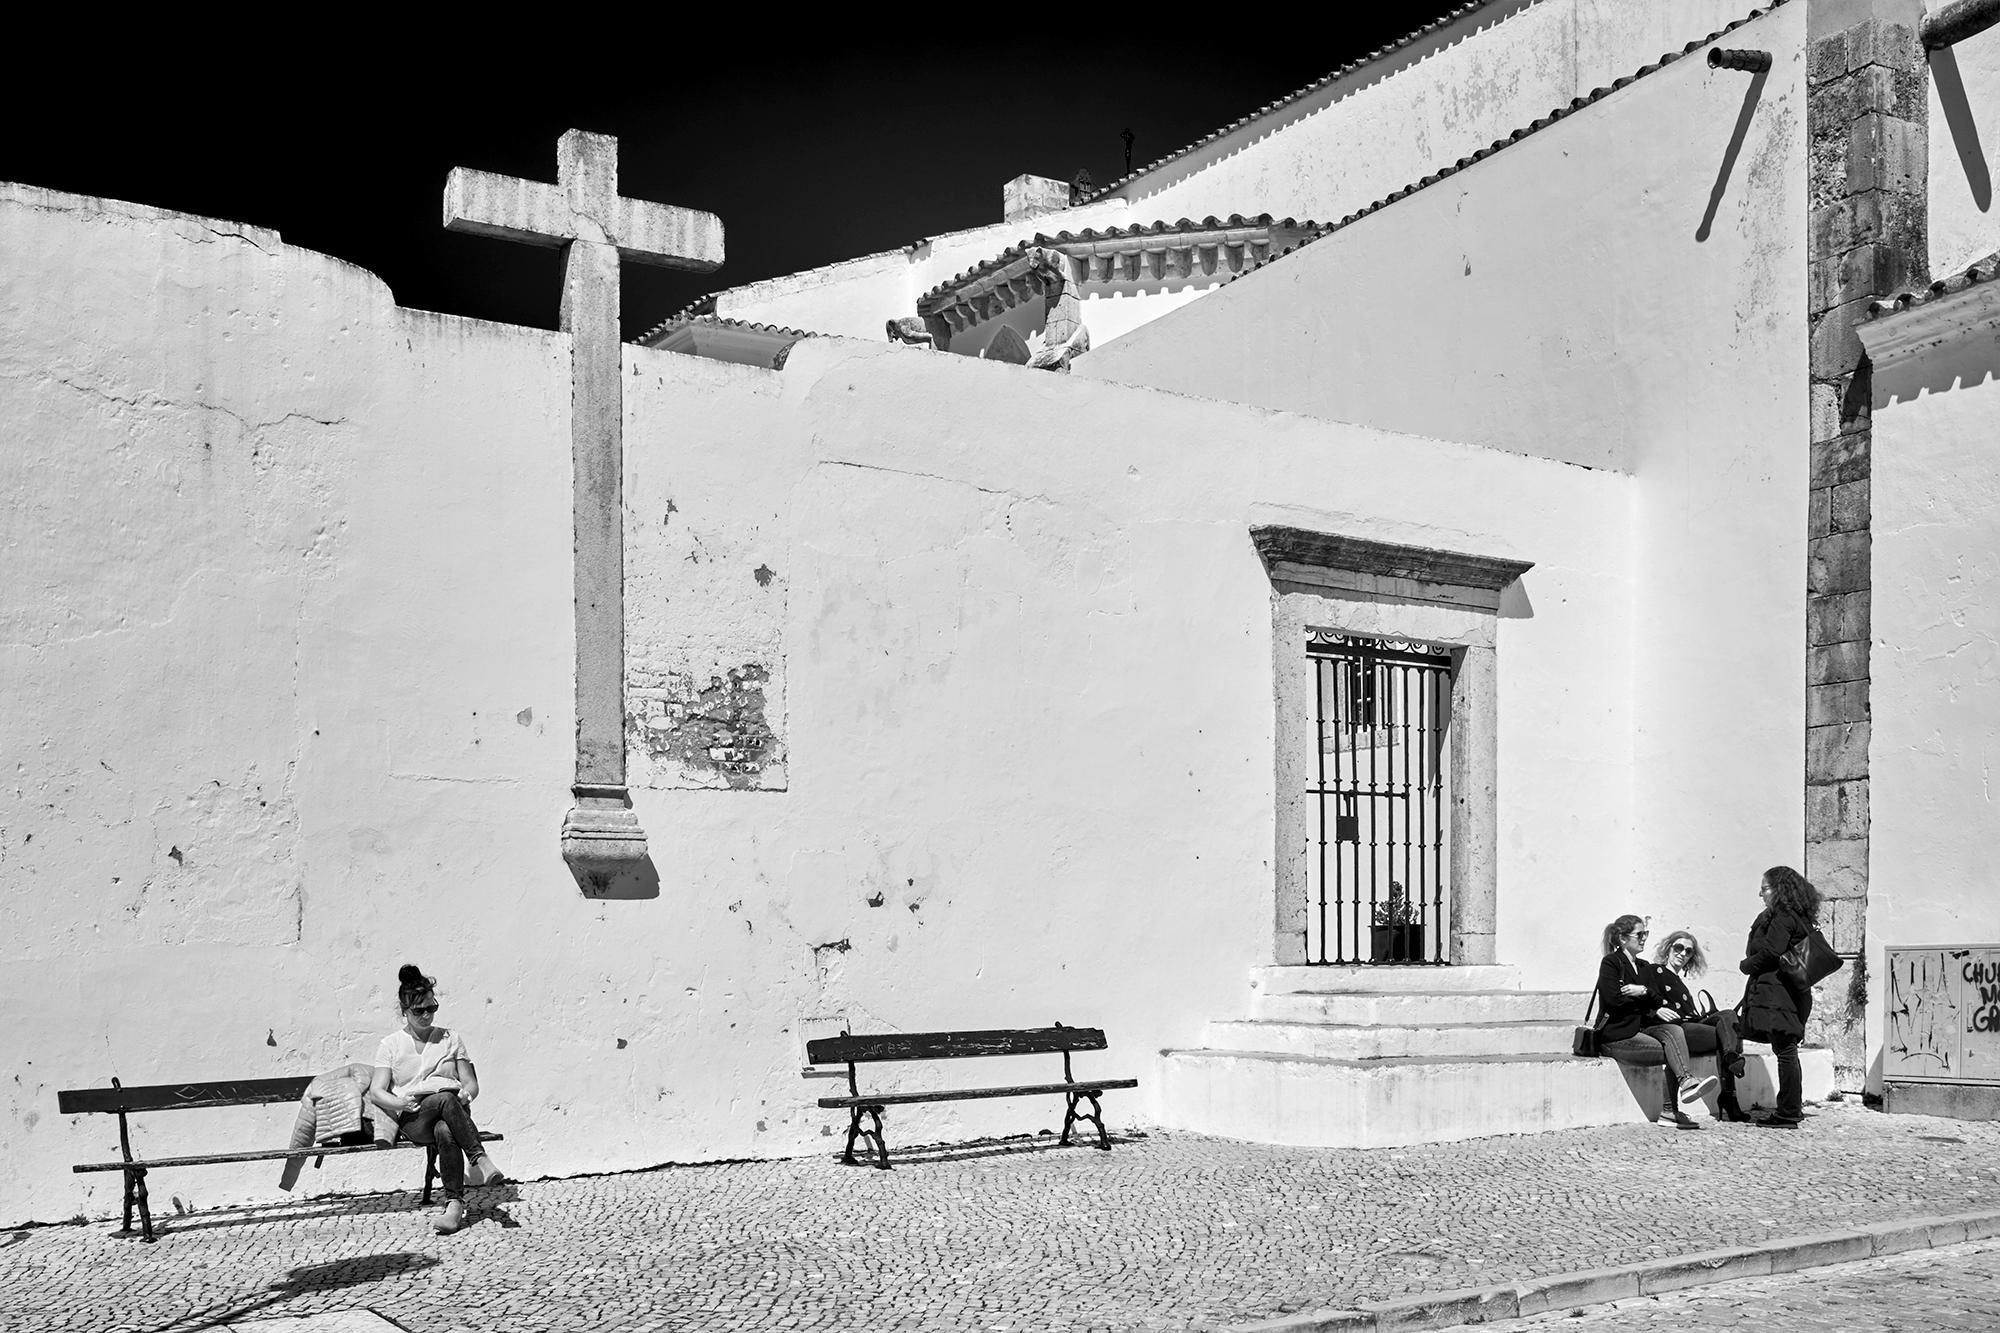 © Rodrigo Cabral Faro 2019